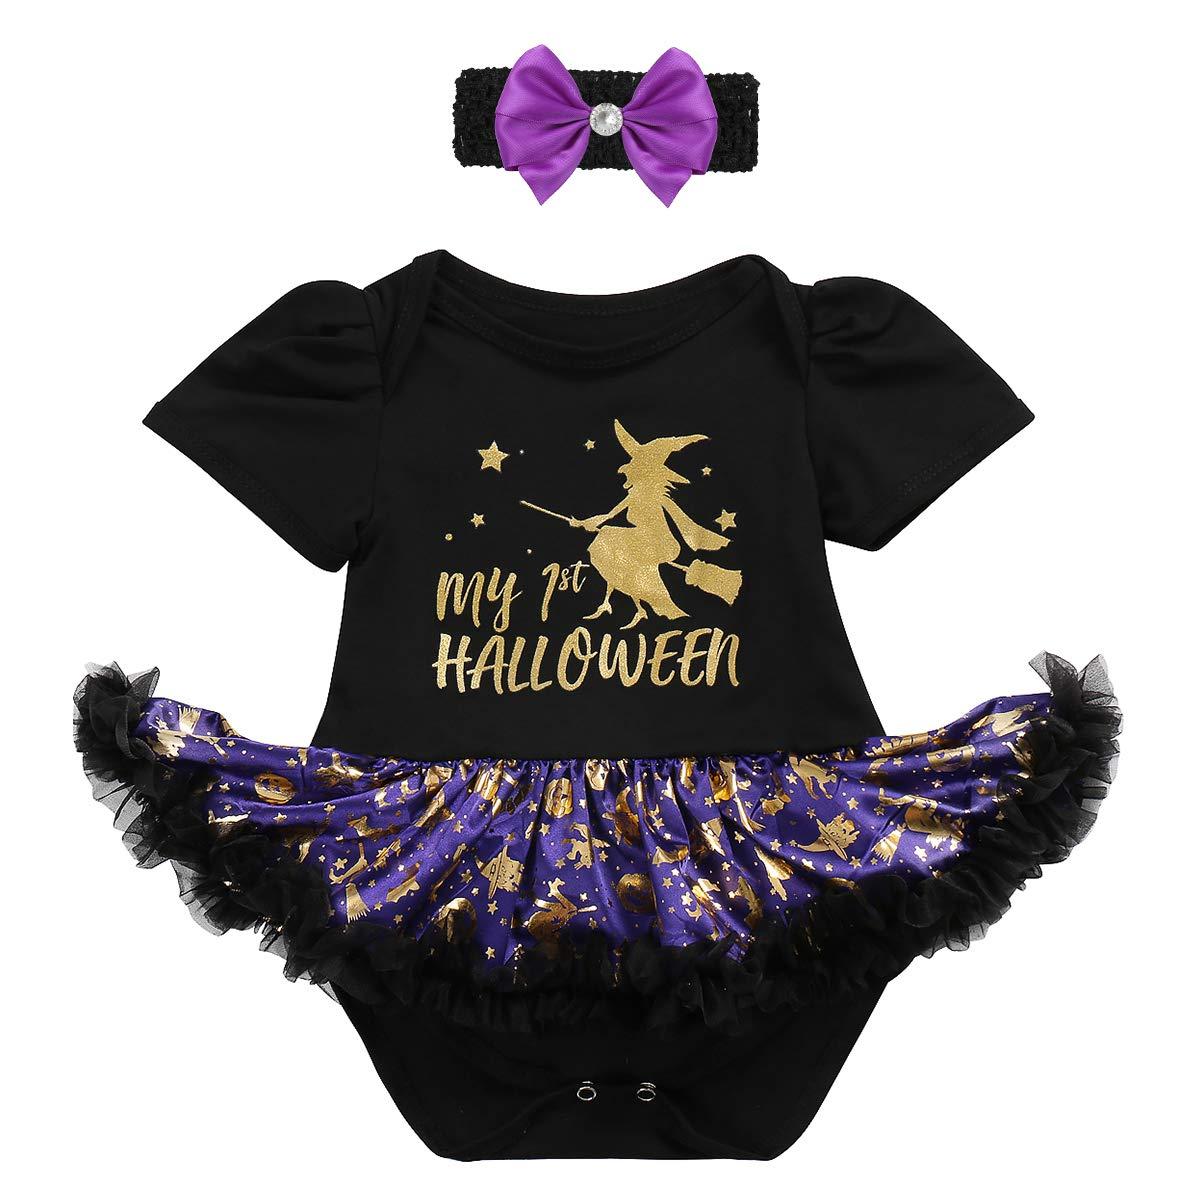 991196e9f8f1 Amazon.com  My 1st Halloween Baby Girls Romper Dress+Headband+Shoes Tutu  Outfit Fancy Dress Party Costume 2 3Pcs Set Infant Clothes  Clothing